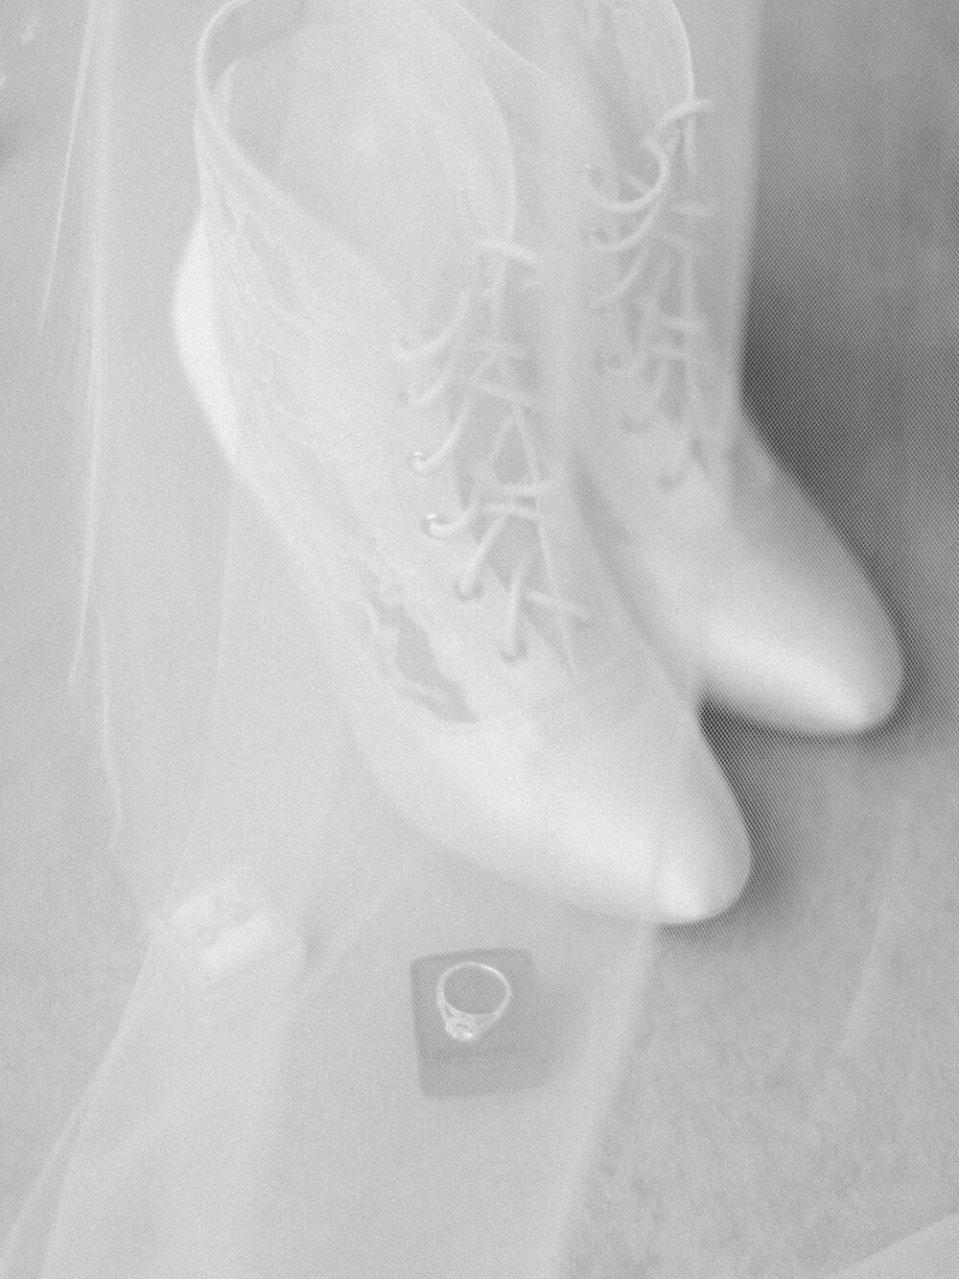 Winter Mapleside Farms Wedding Photography-4.jpg